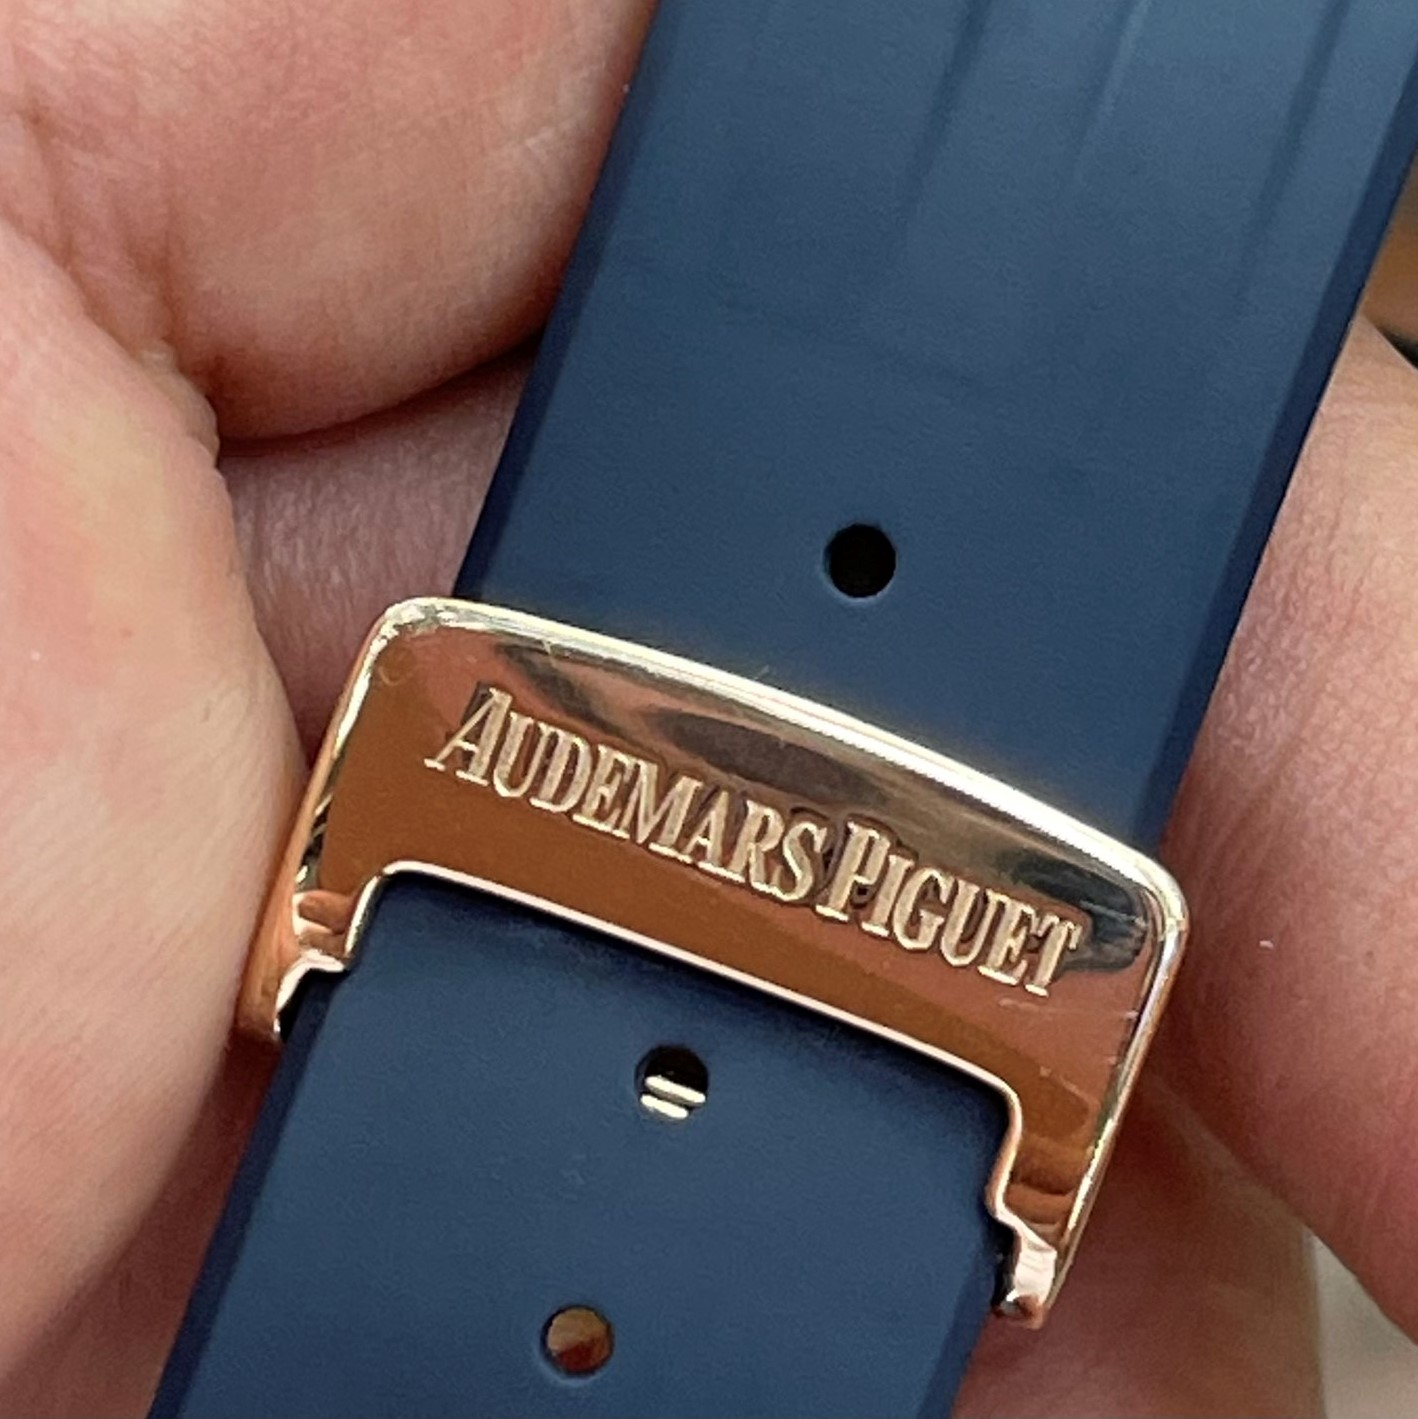 Audemars Piguet Royal Oak 15300 Rose Gold Size 39mm